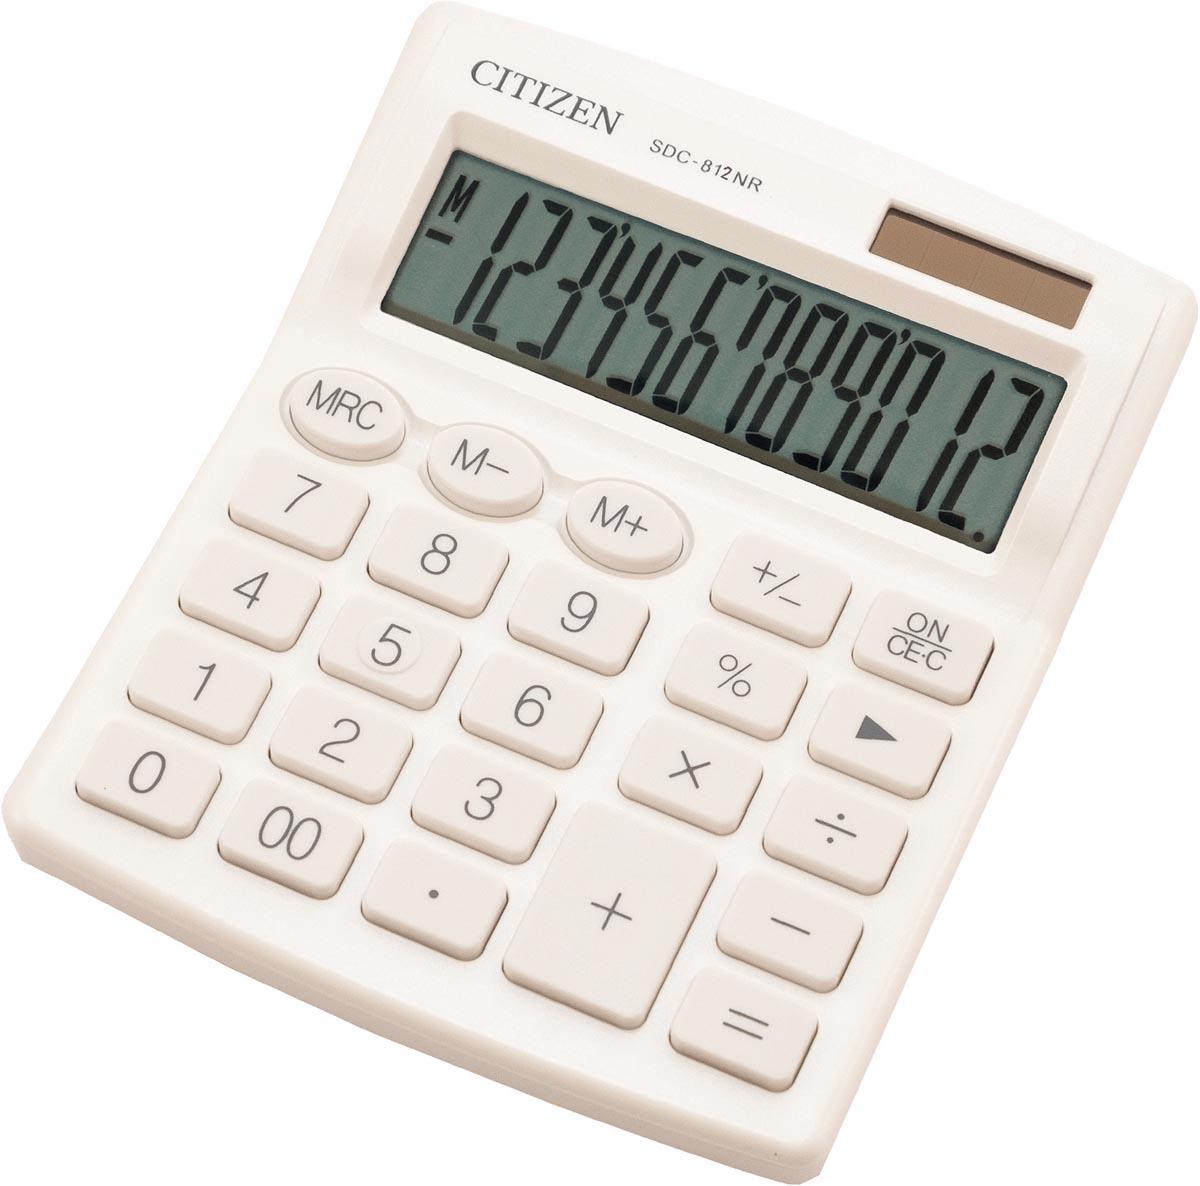 Citizen bureaurekenmachine SDC-812, wit